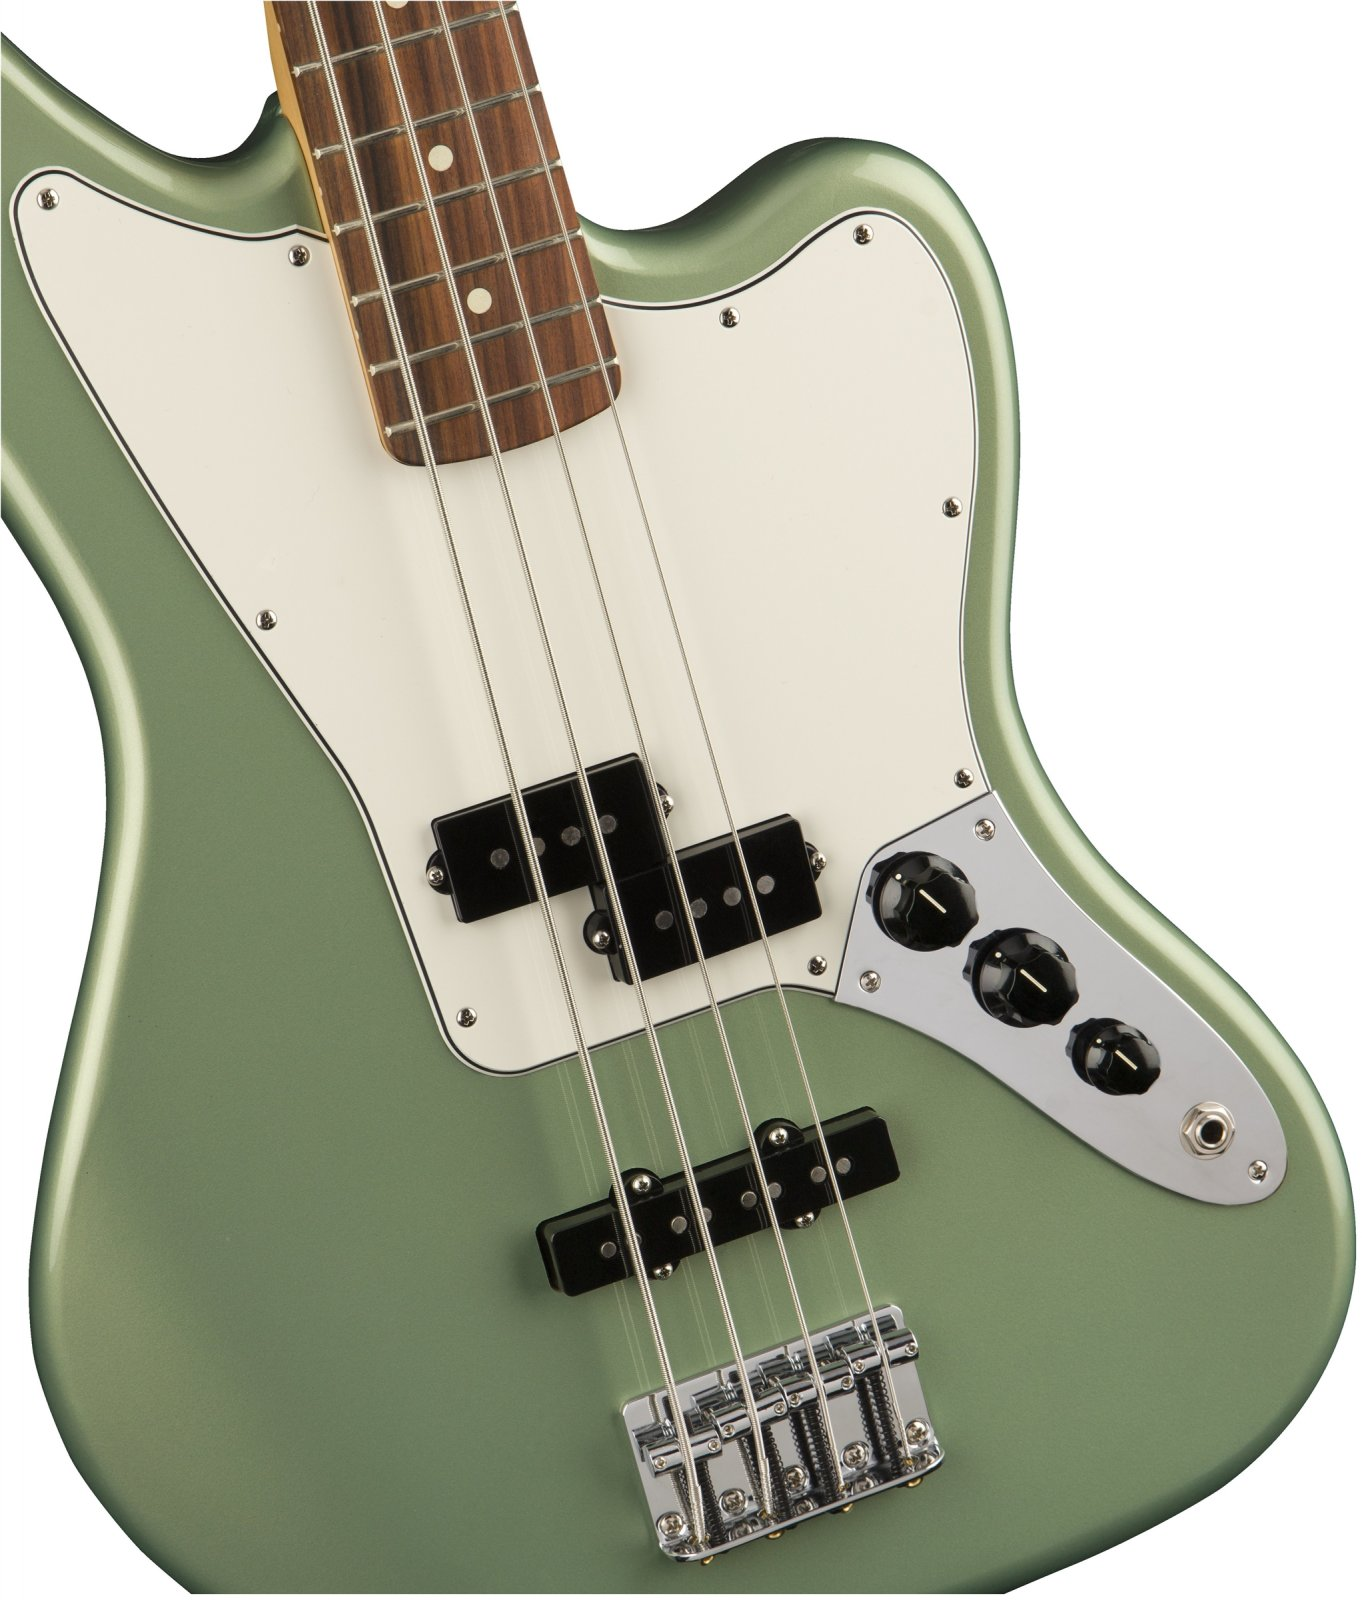 Fender Player Series Jaguar Bass - Sage Green Metallic w/ Pao Ferro Fingerboard